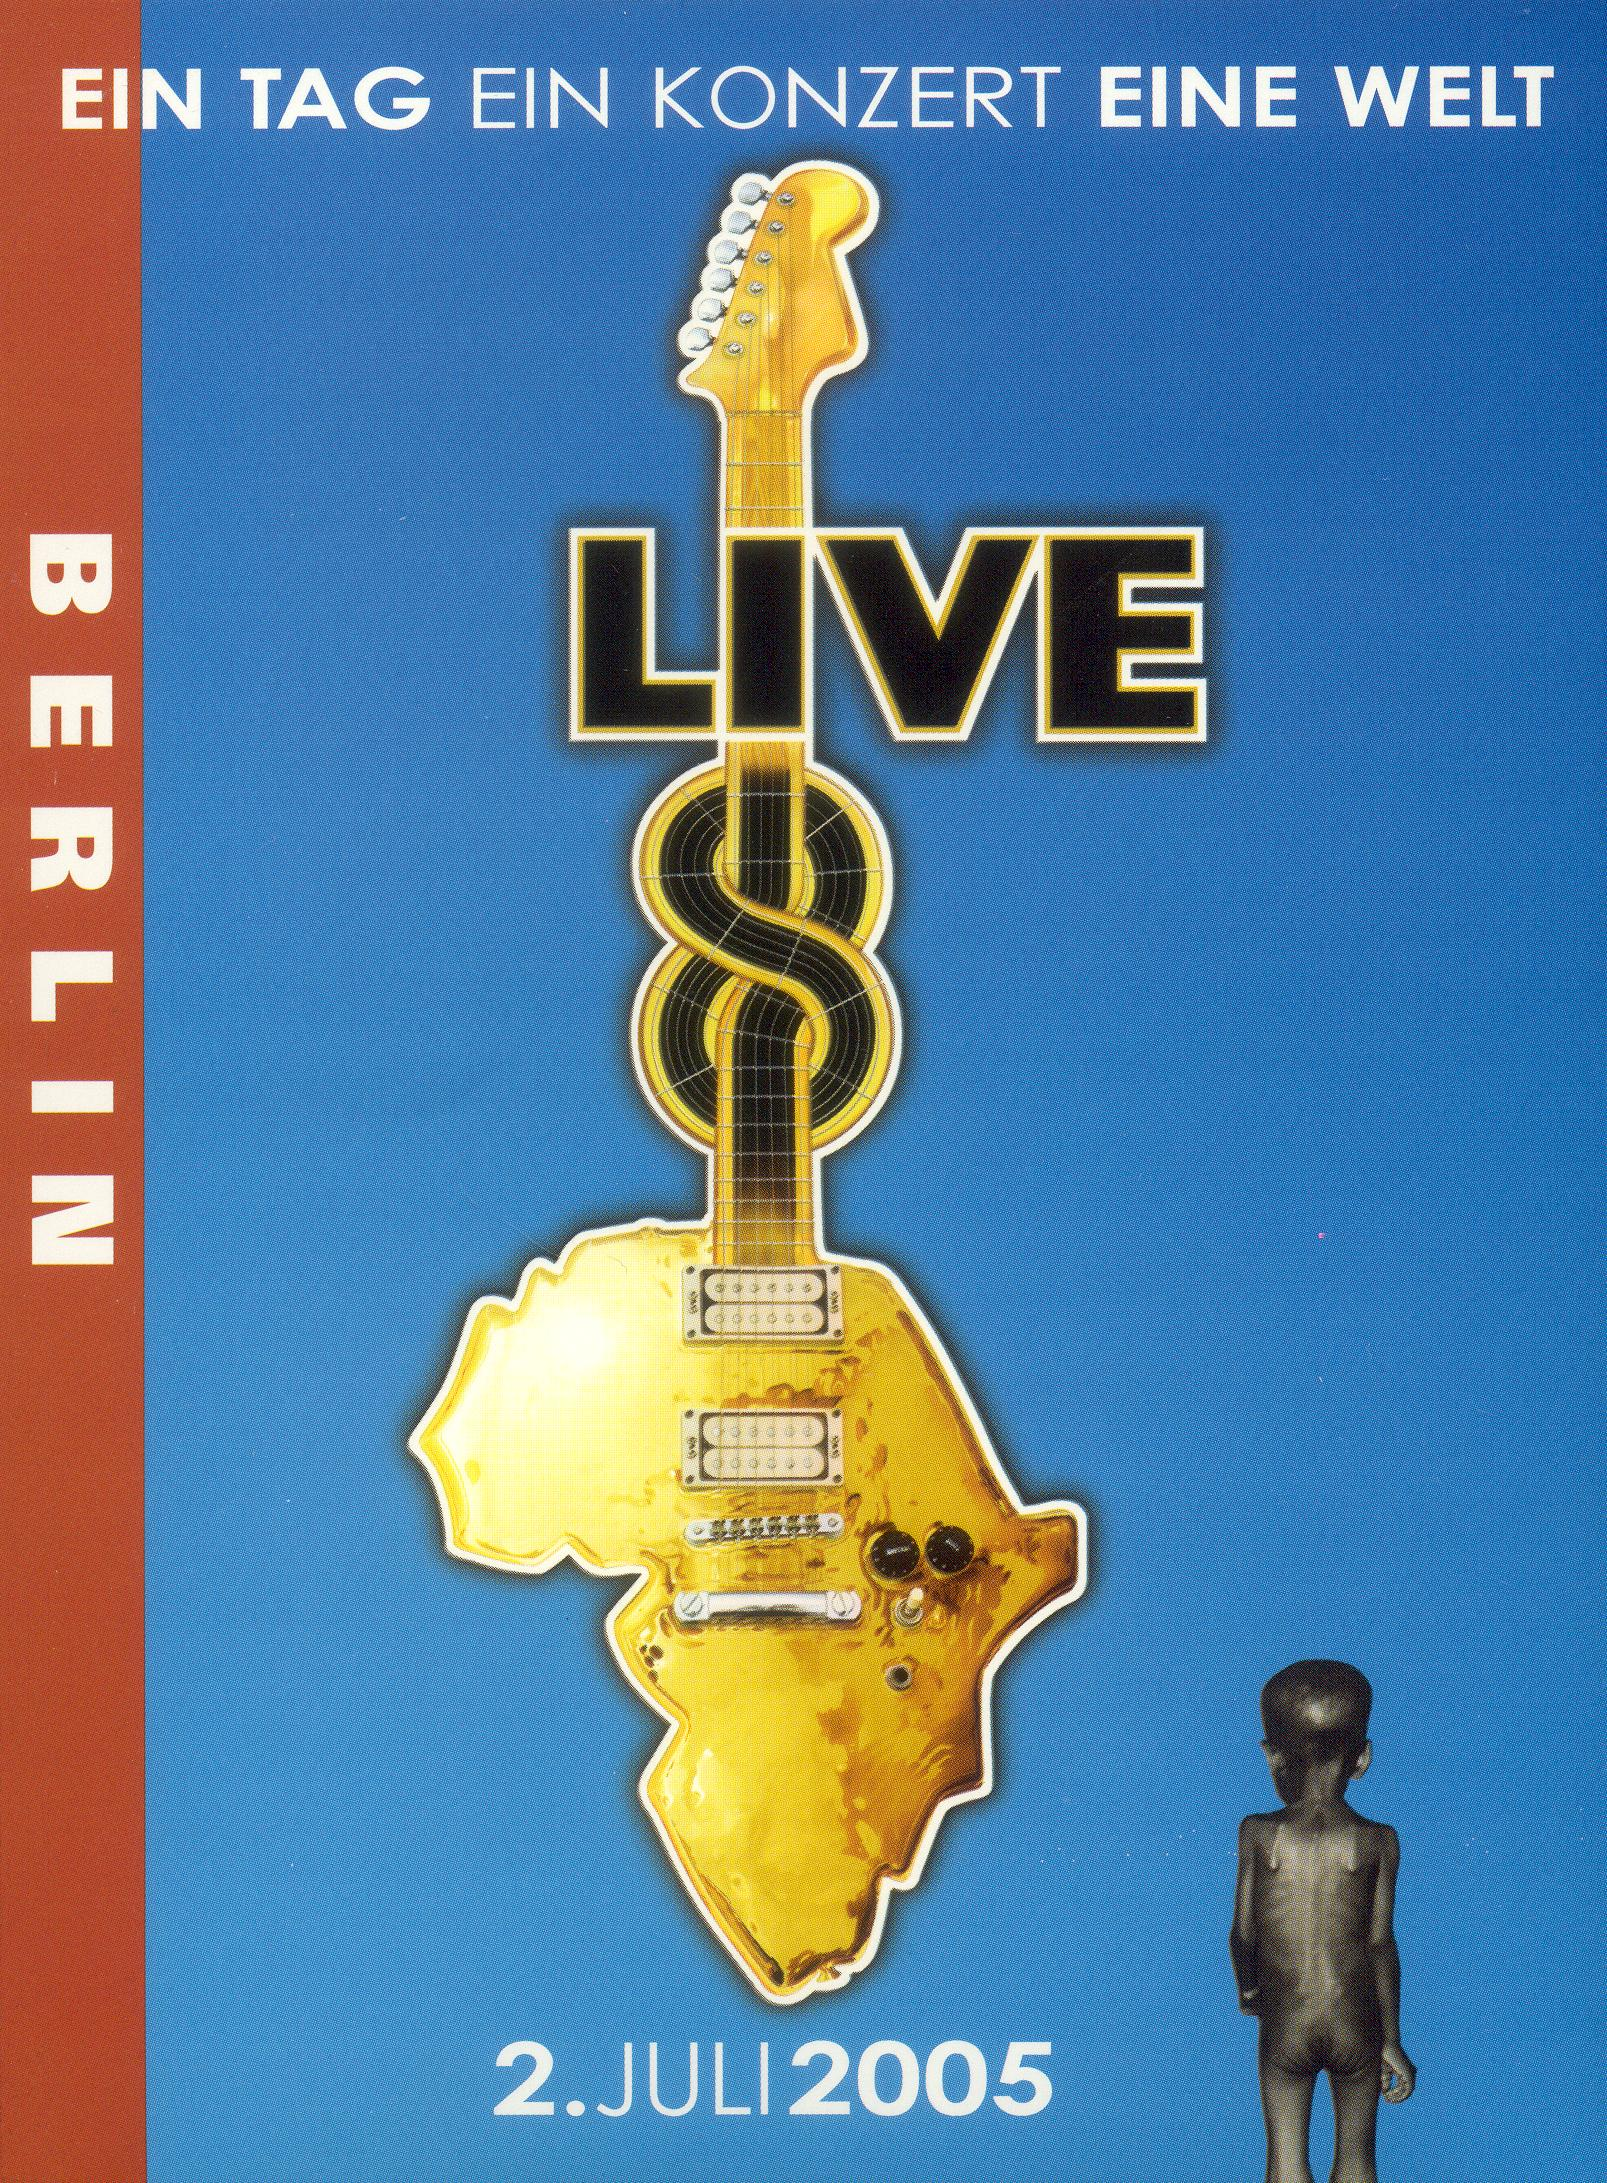 Live 8 Berlin